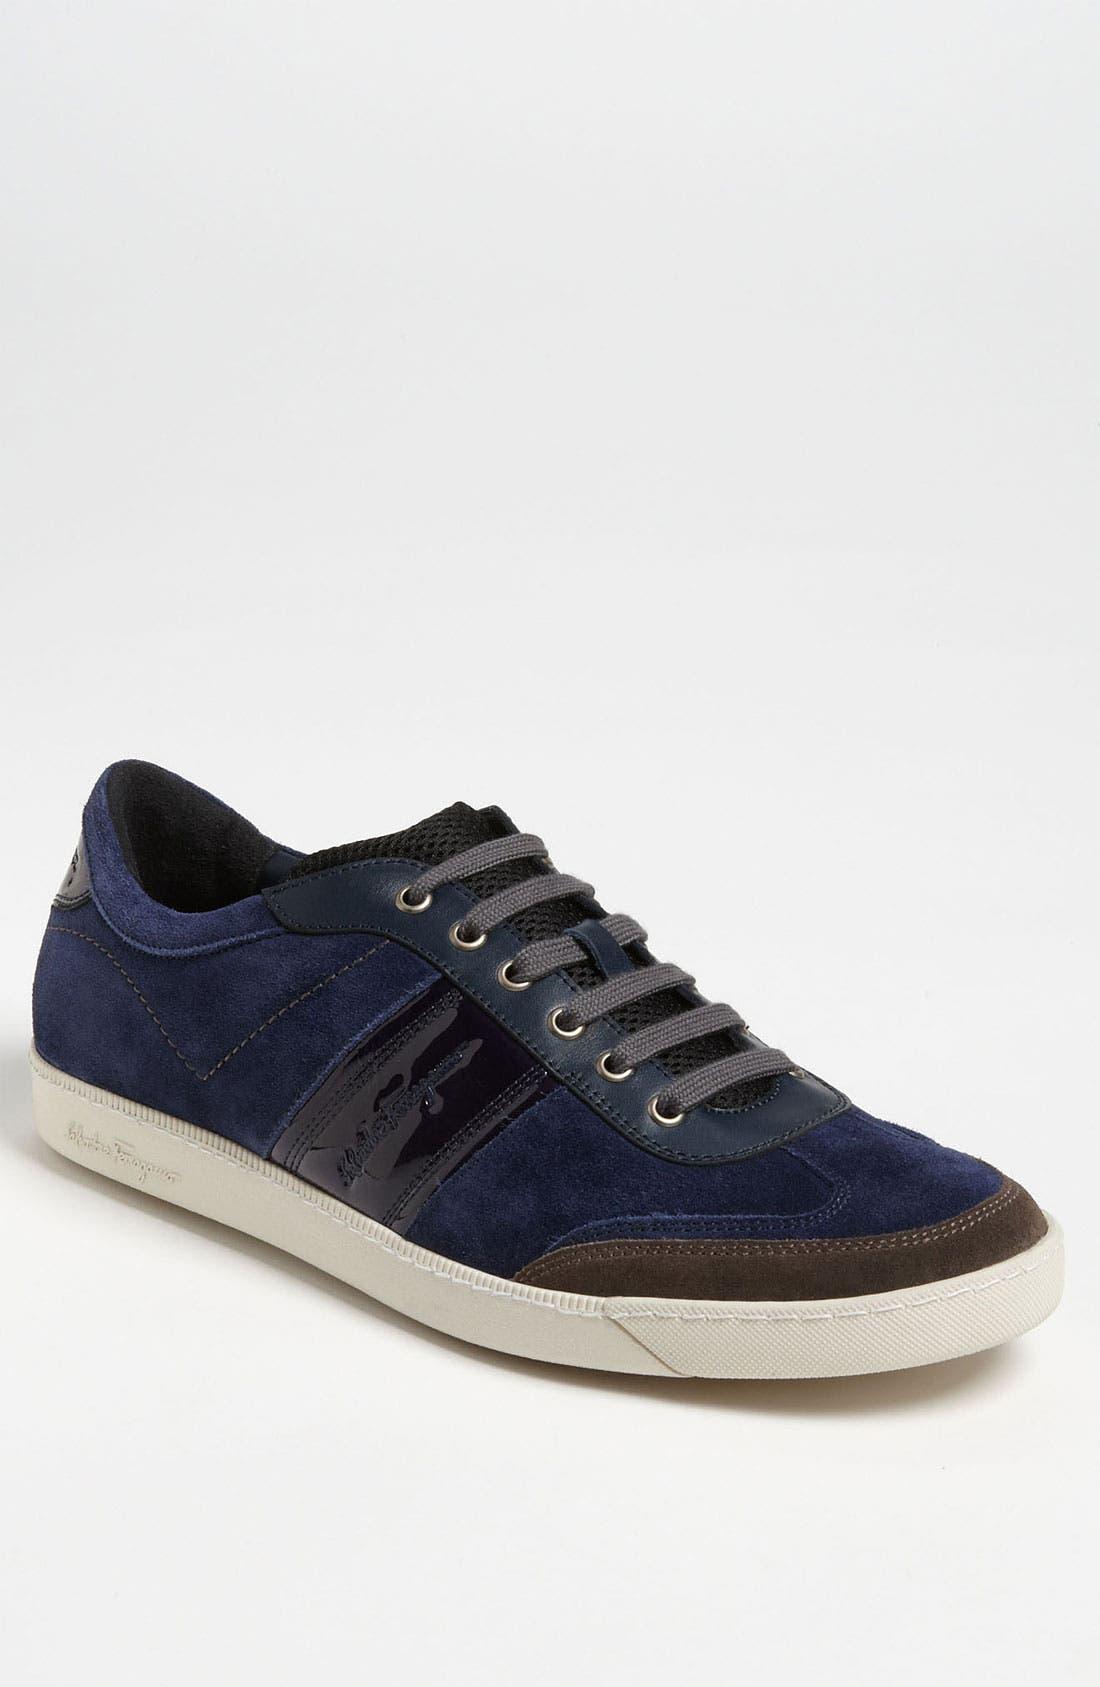 Alternate Image 1 Selected - Salvatore Ferragamo 'Marling' Sneaker